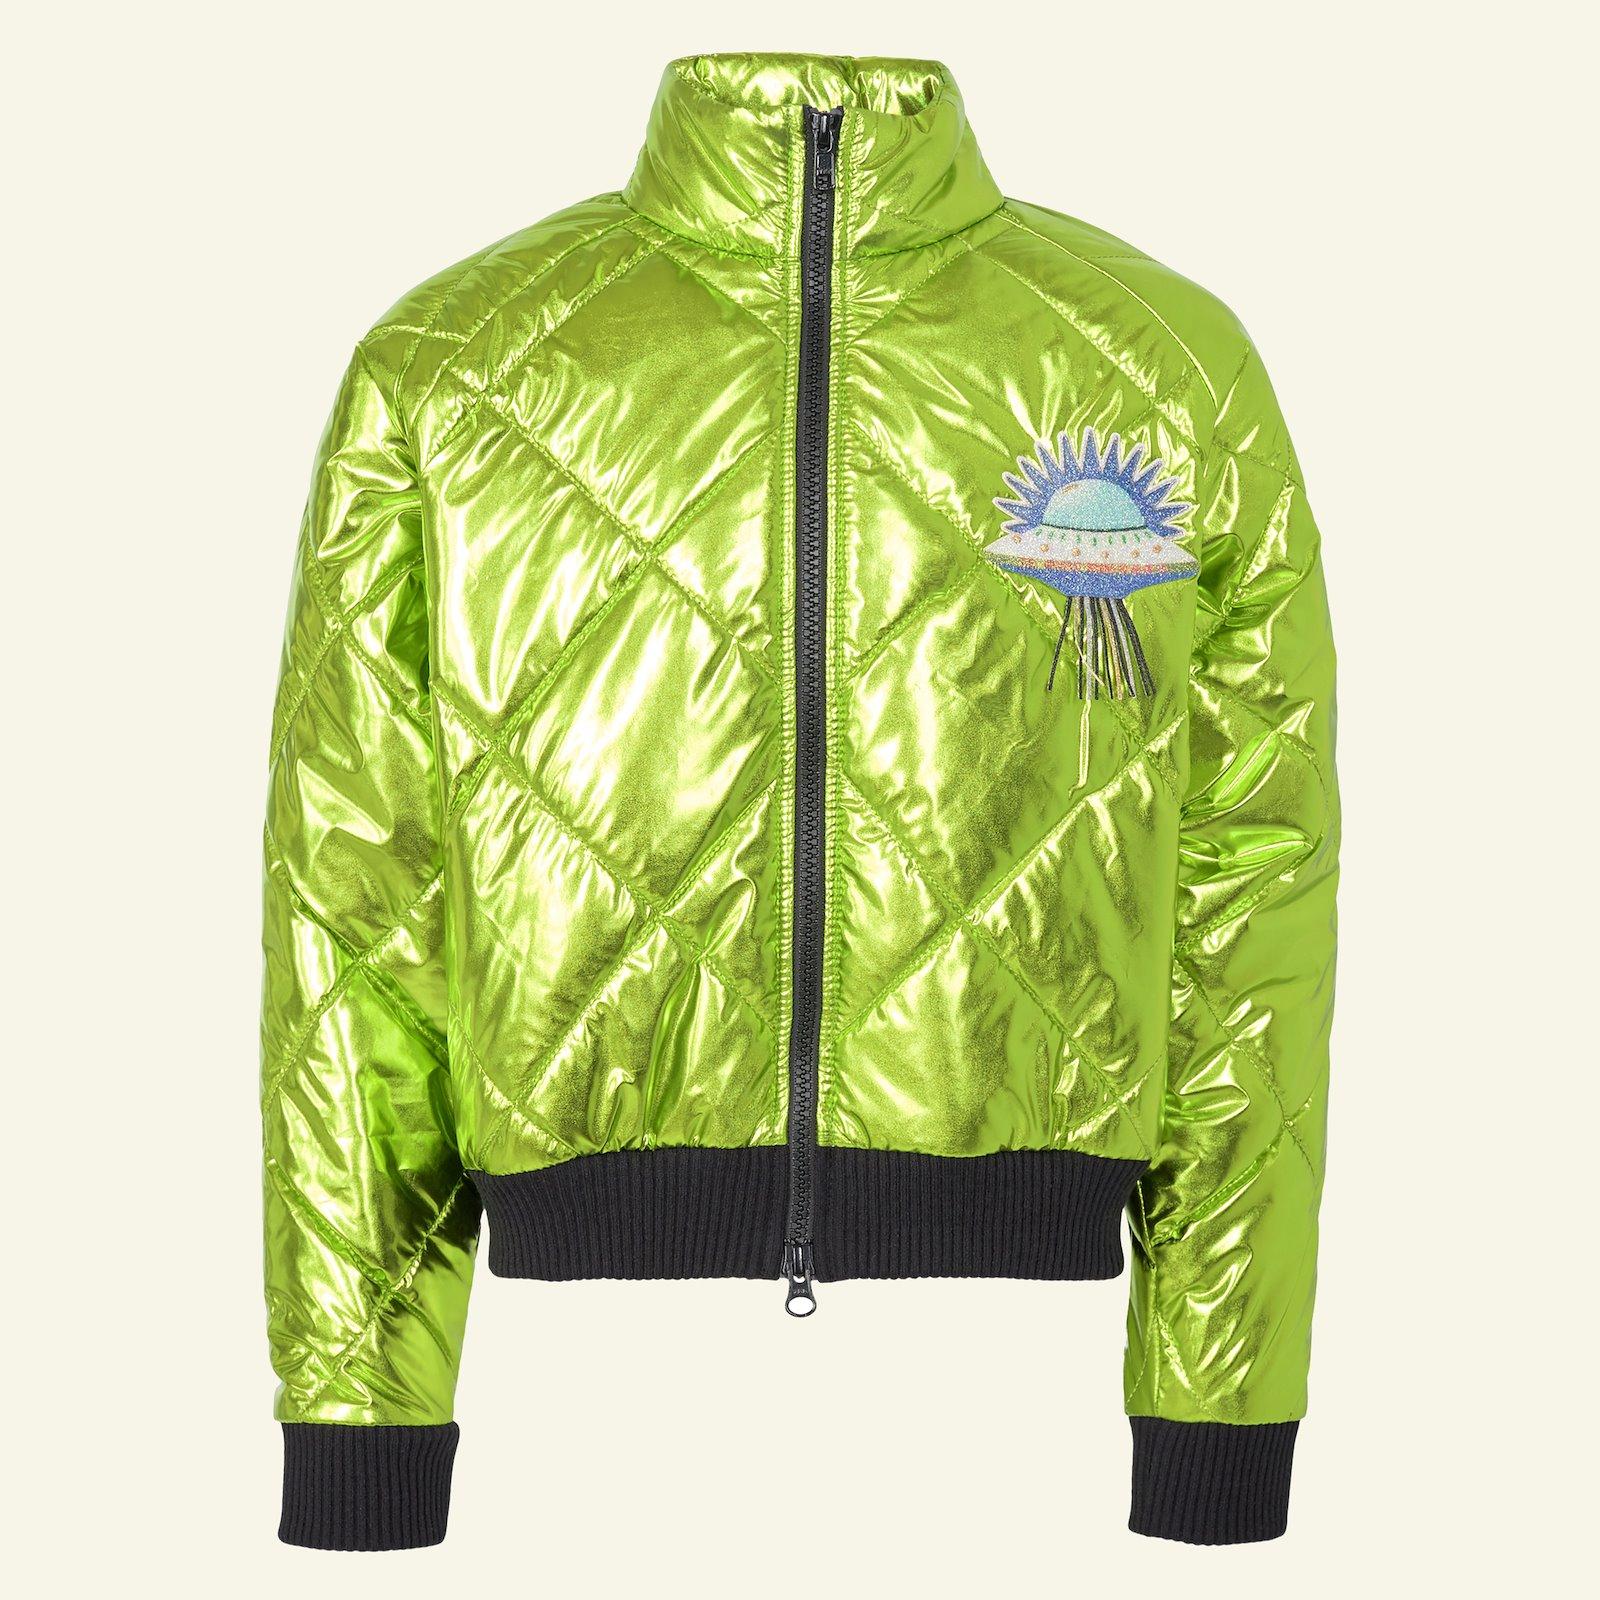 Anorak and jacket, 122/7y p64020_920221_96077_26464_sskit